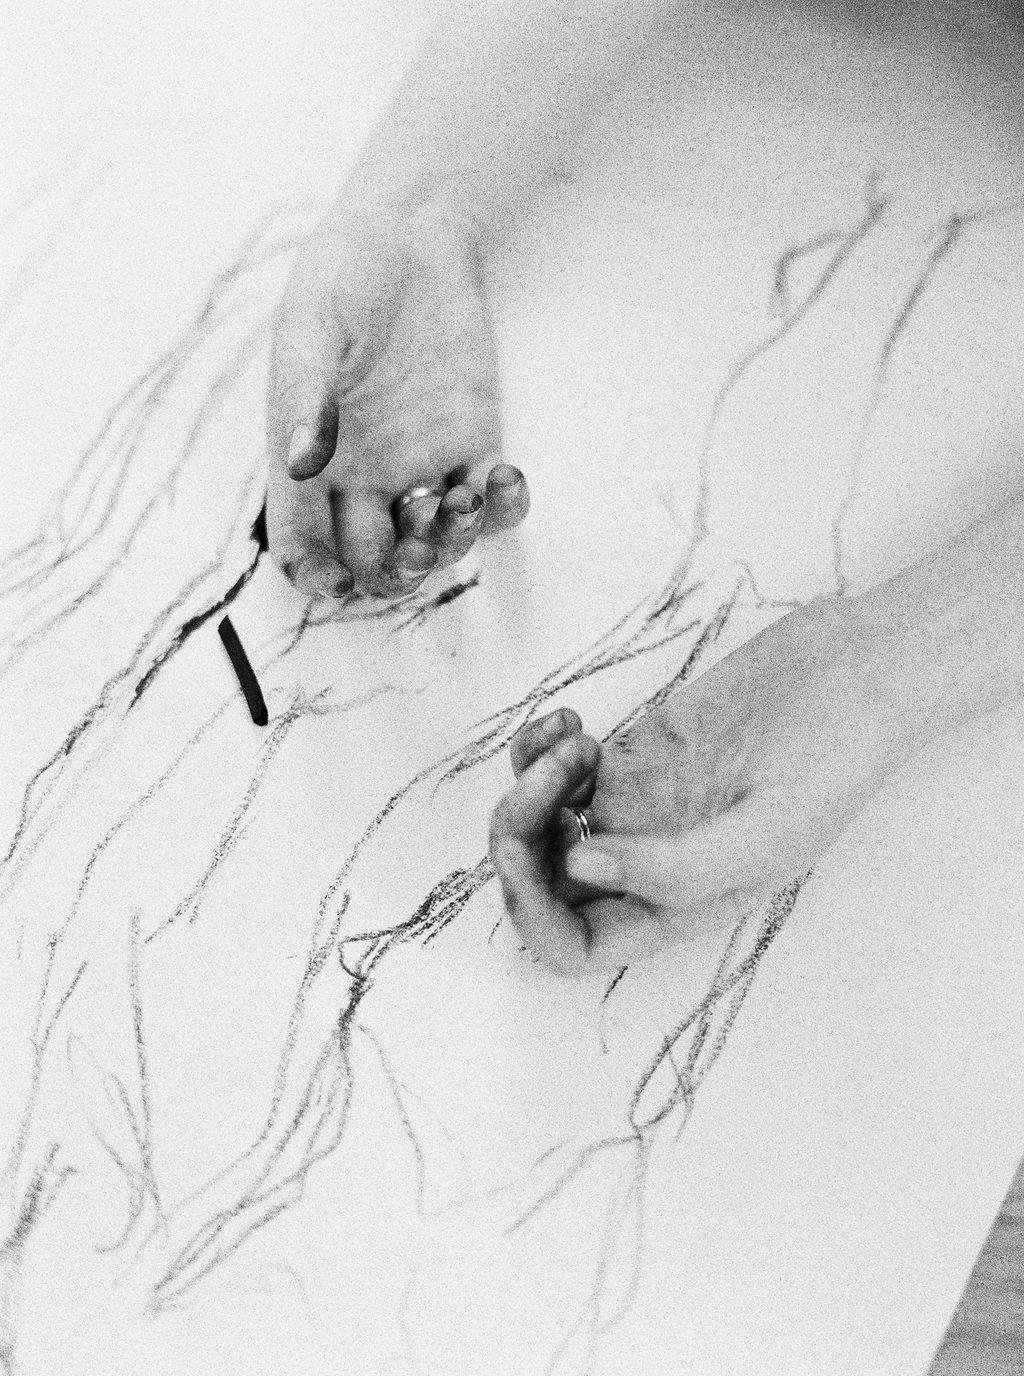 sandra-chau-stylist-fine-art-branding-shoot-mishku-studio-artist-hands-unearthingtc.jpg